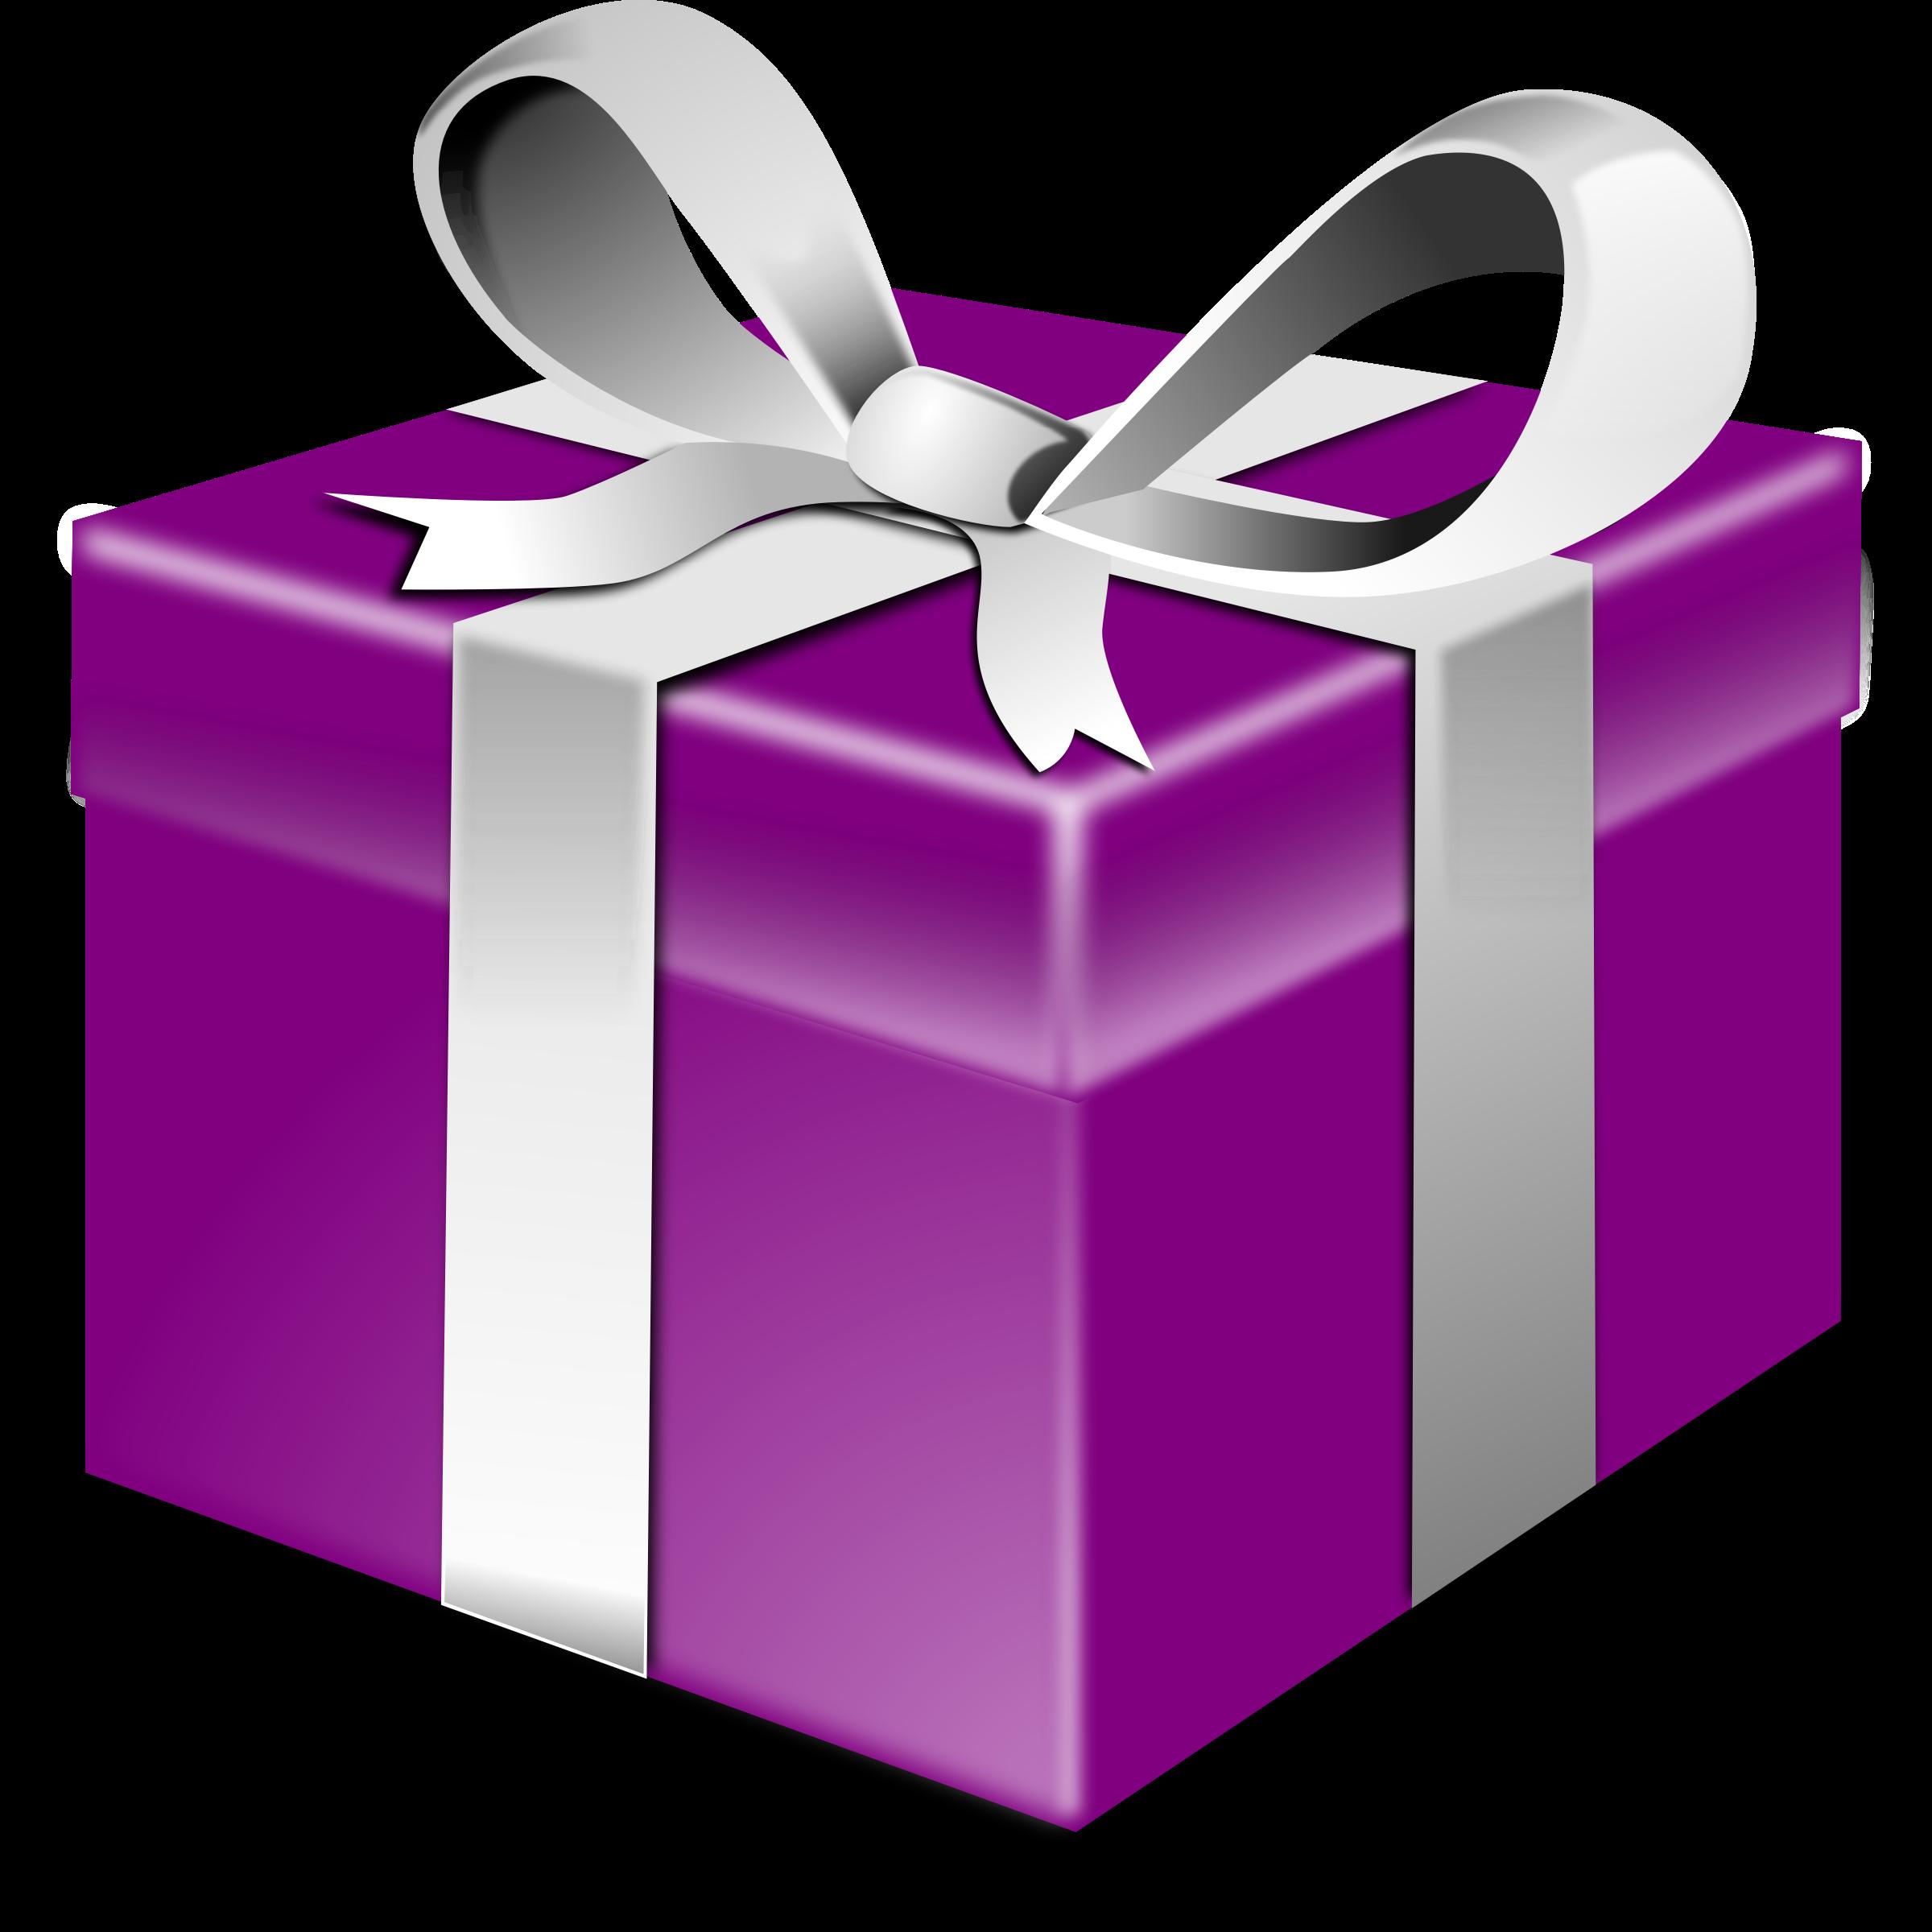 Purple gift bow.